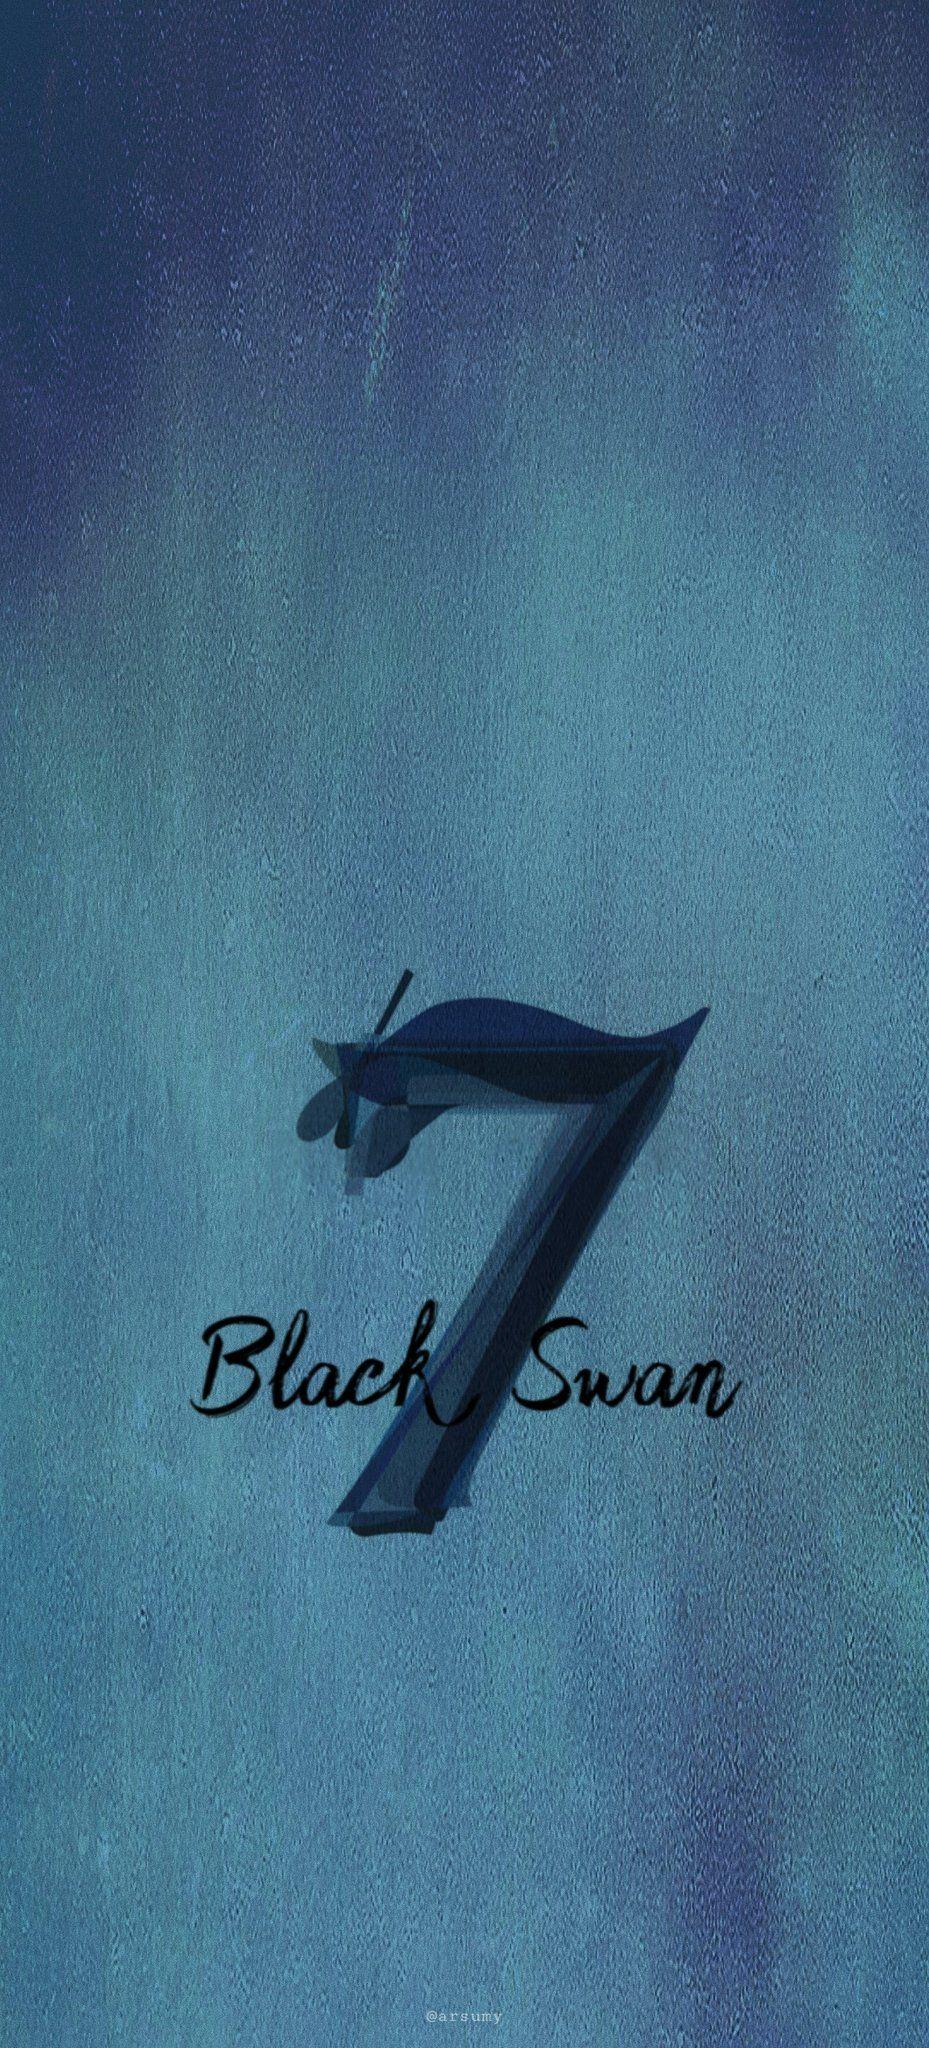 on Twitter Bts wallpaper lyrics Swan wallpaper 929x2048